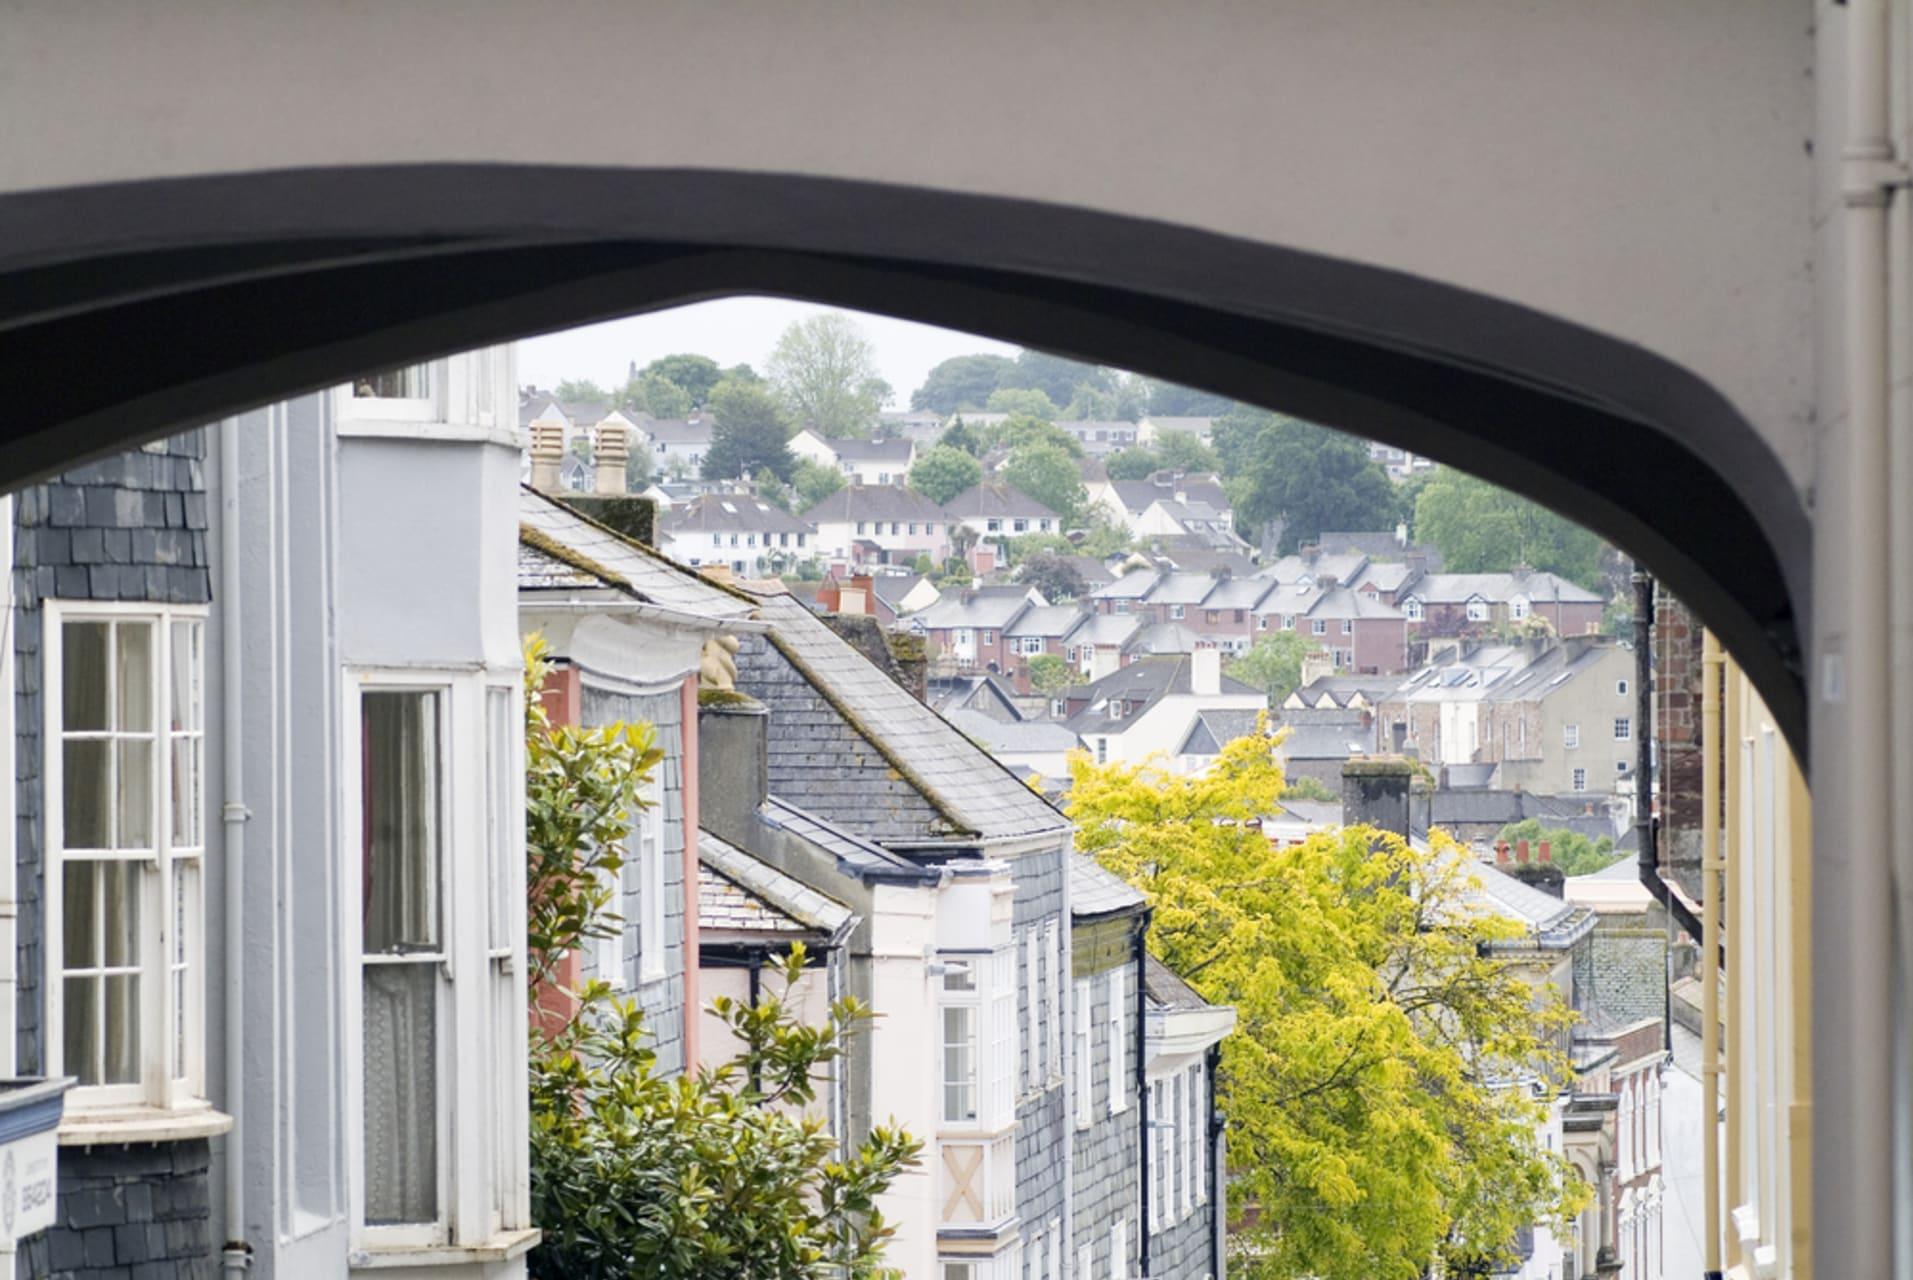 Devon - Totnes: Twinned with Narnia